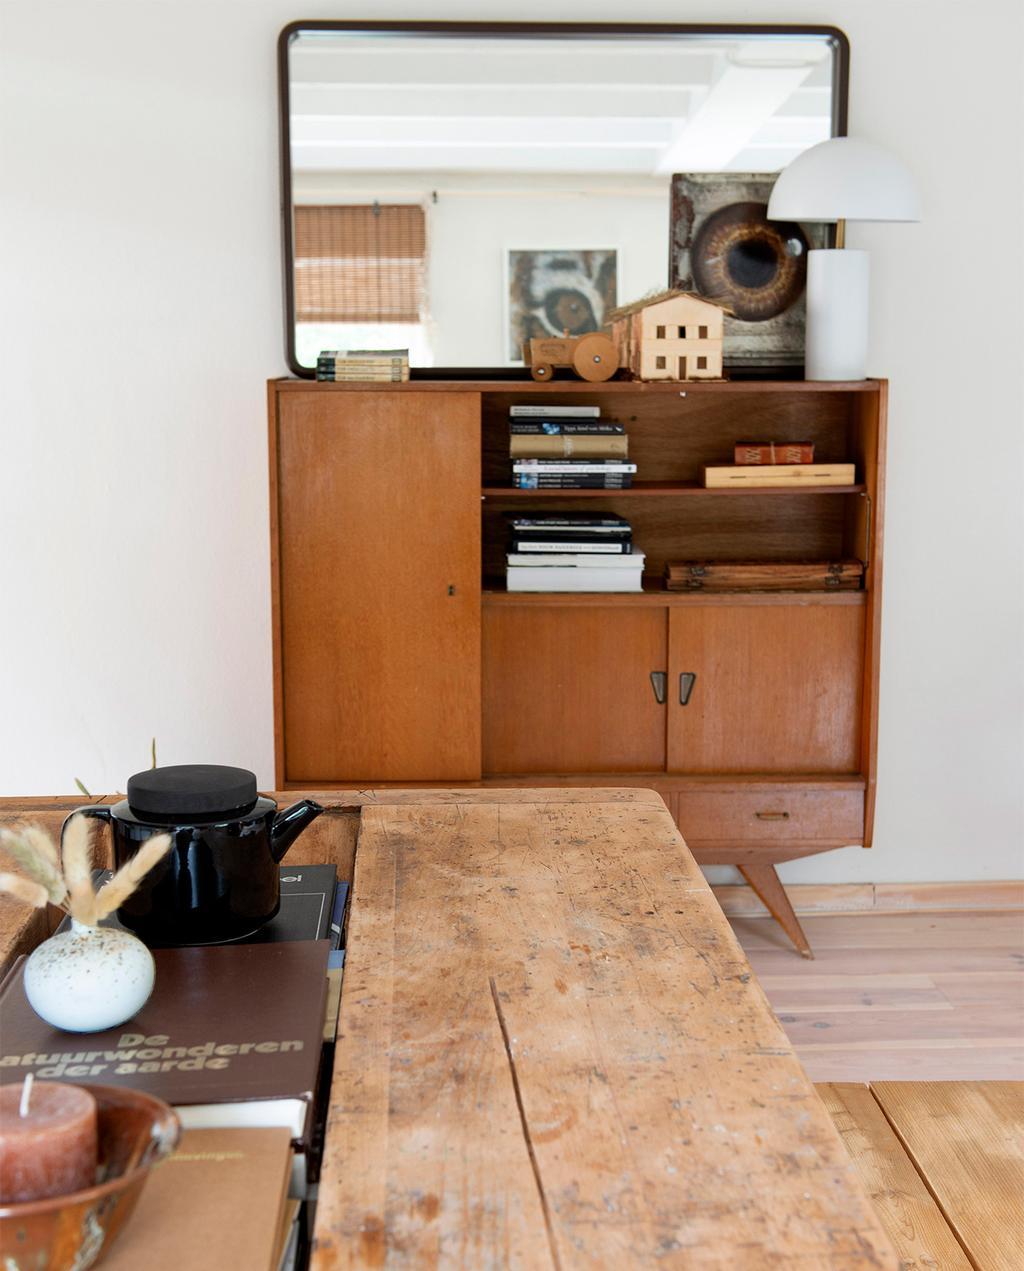 vtwonen 08-2021 | houten dressoir met houten tafel | vlooienmarkten Nederland België